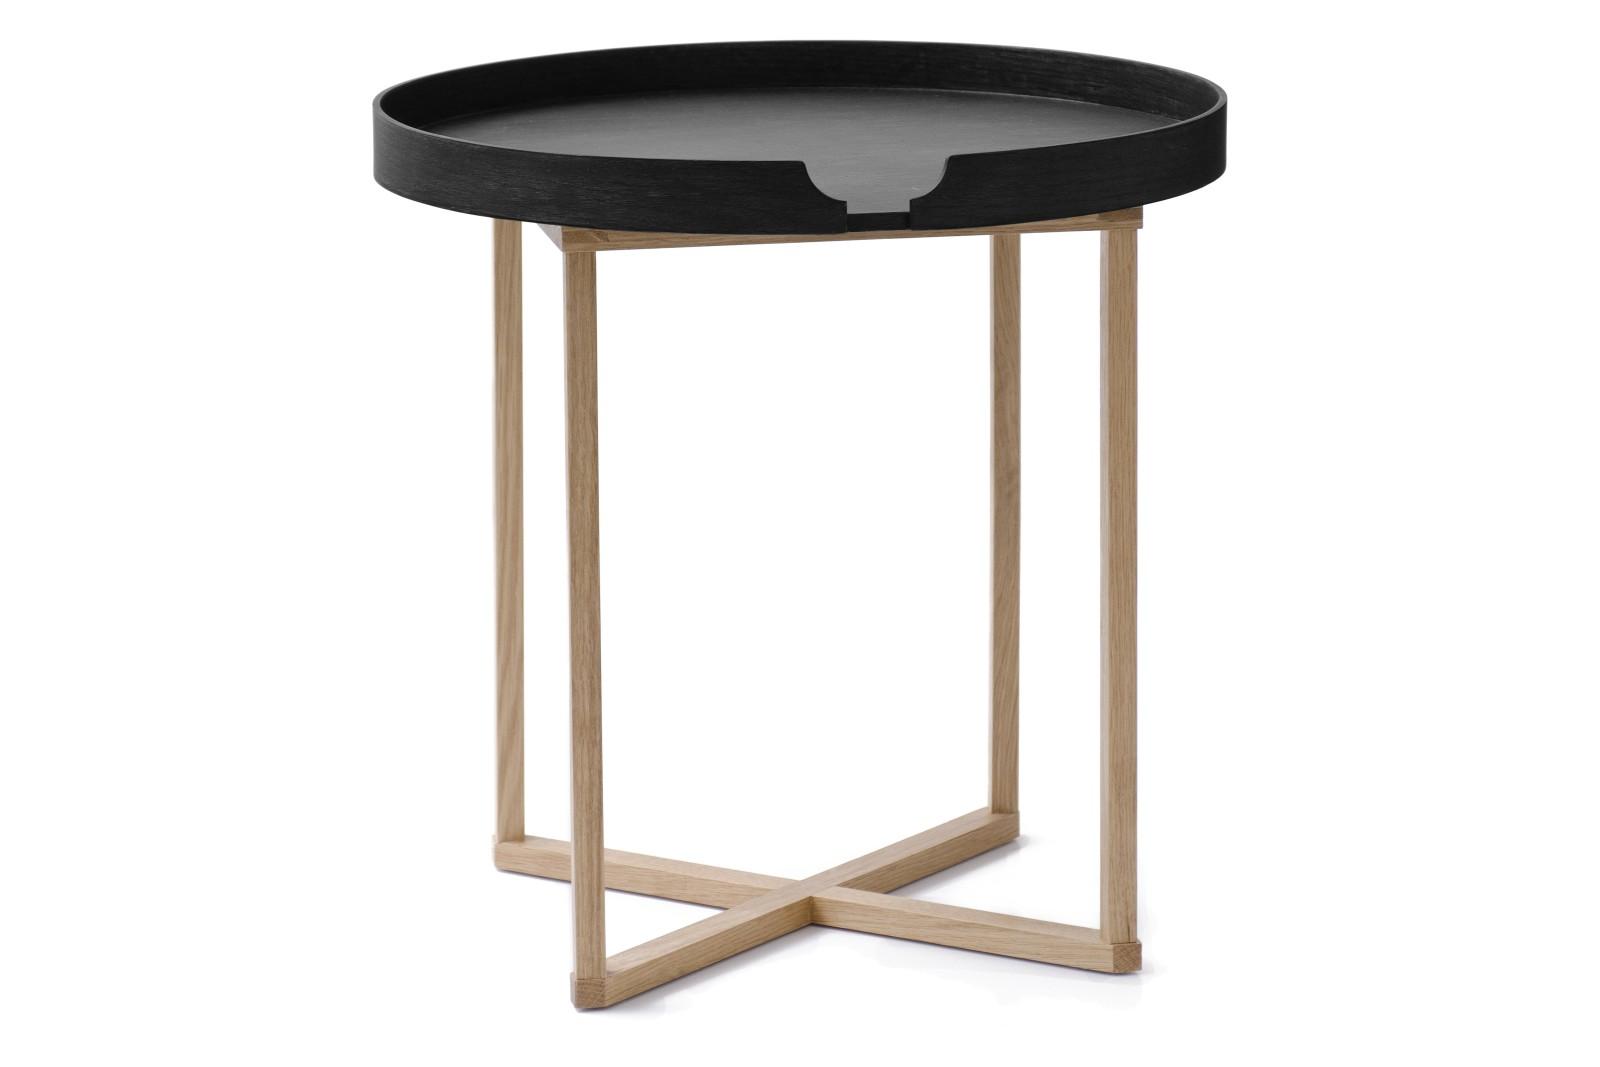 Damien Round Side Table Black